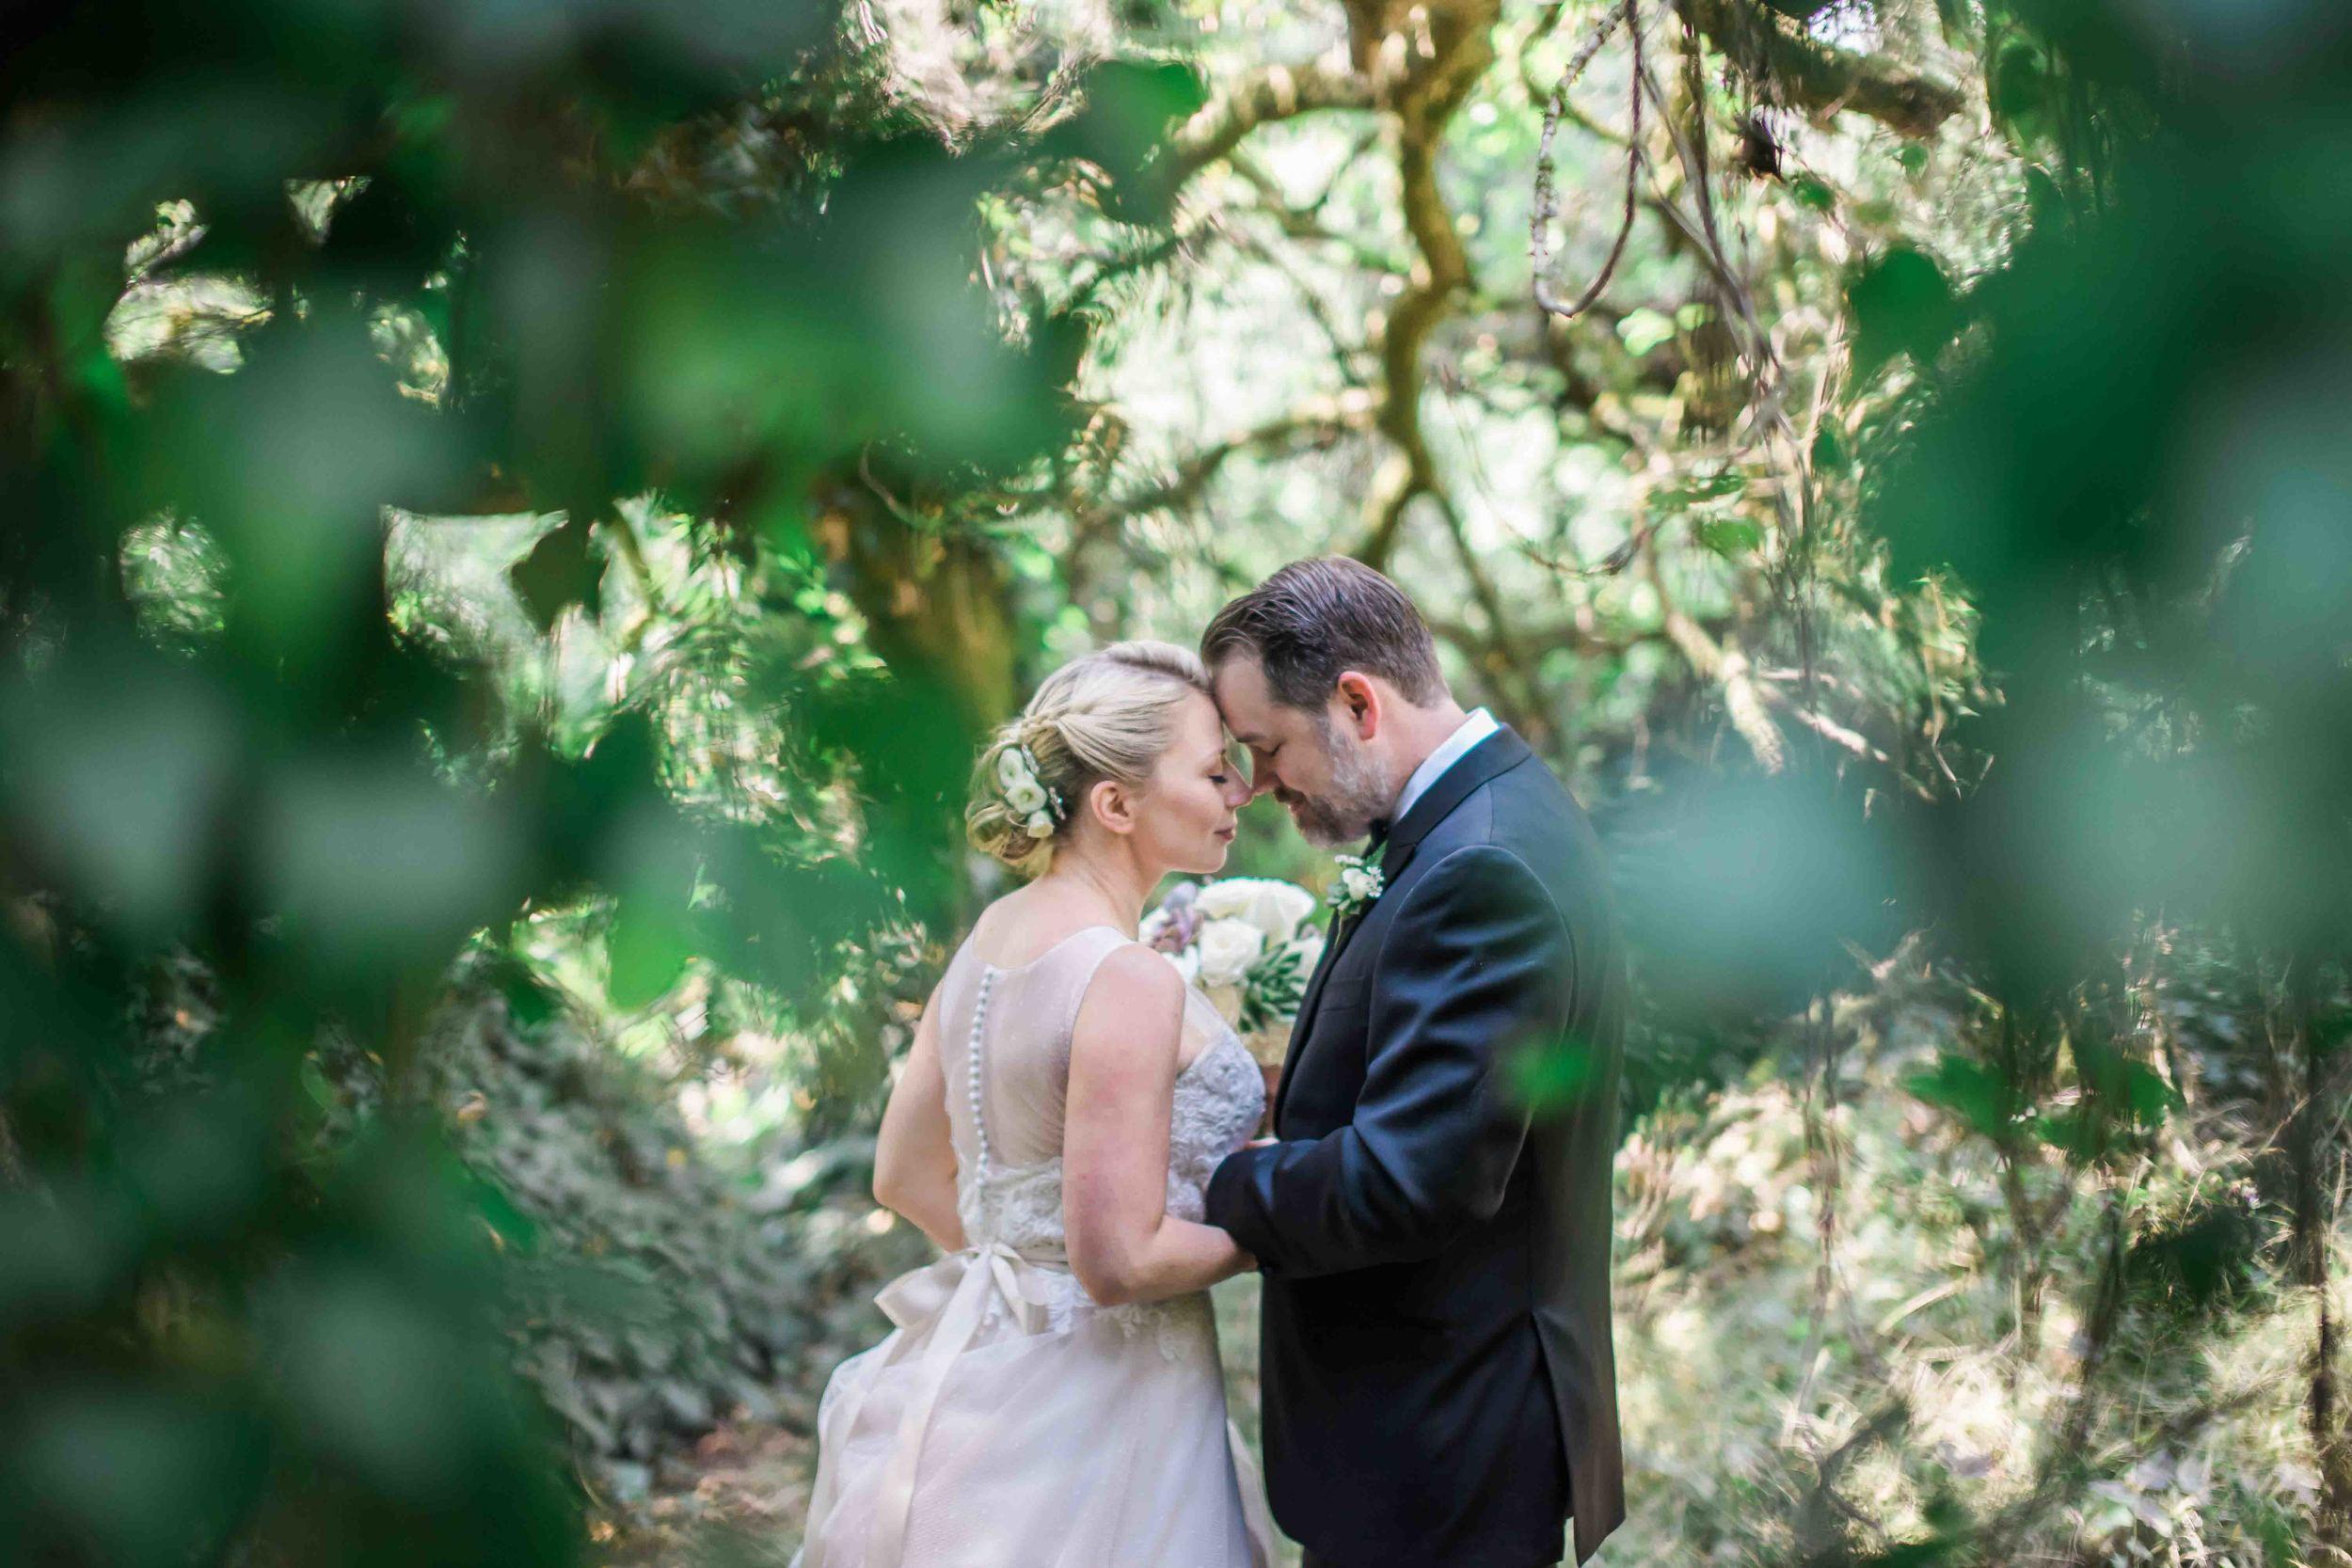 ChrisandAnja_WEDDING_Brienne_Michelle_Photography_225.JPG